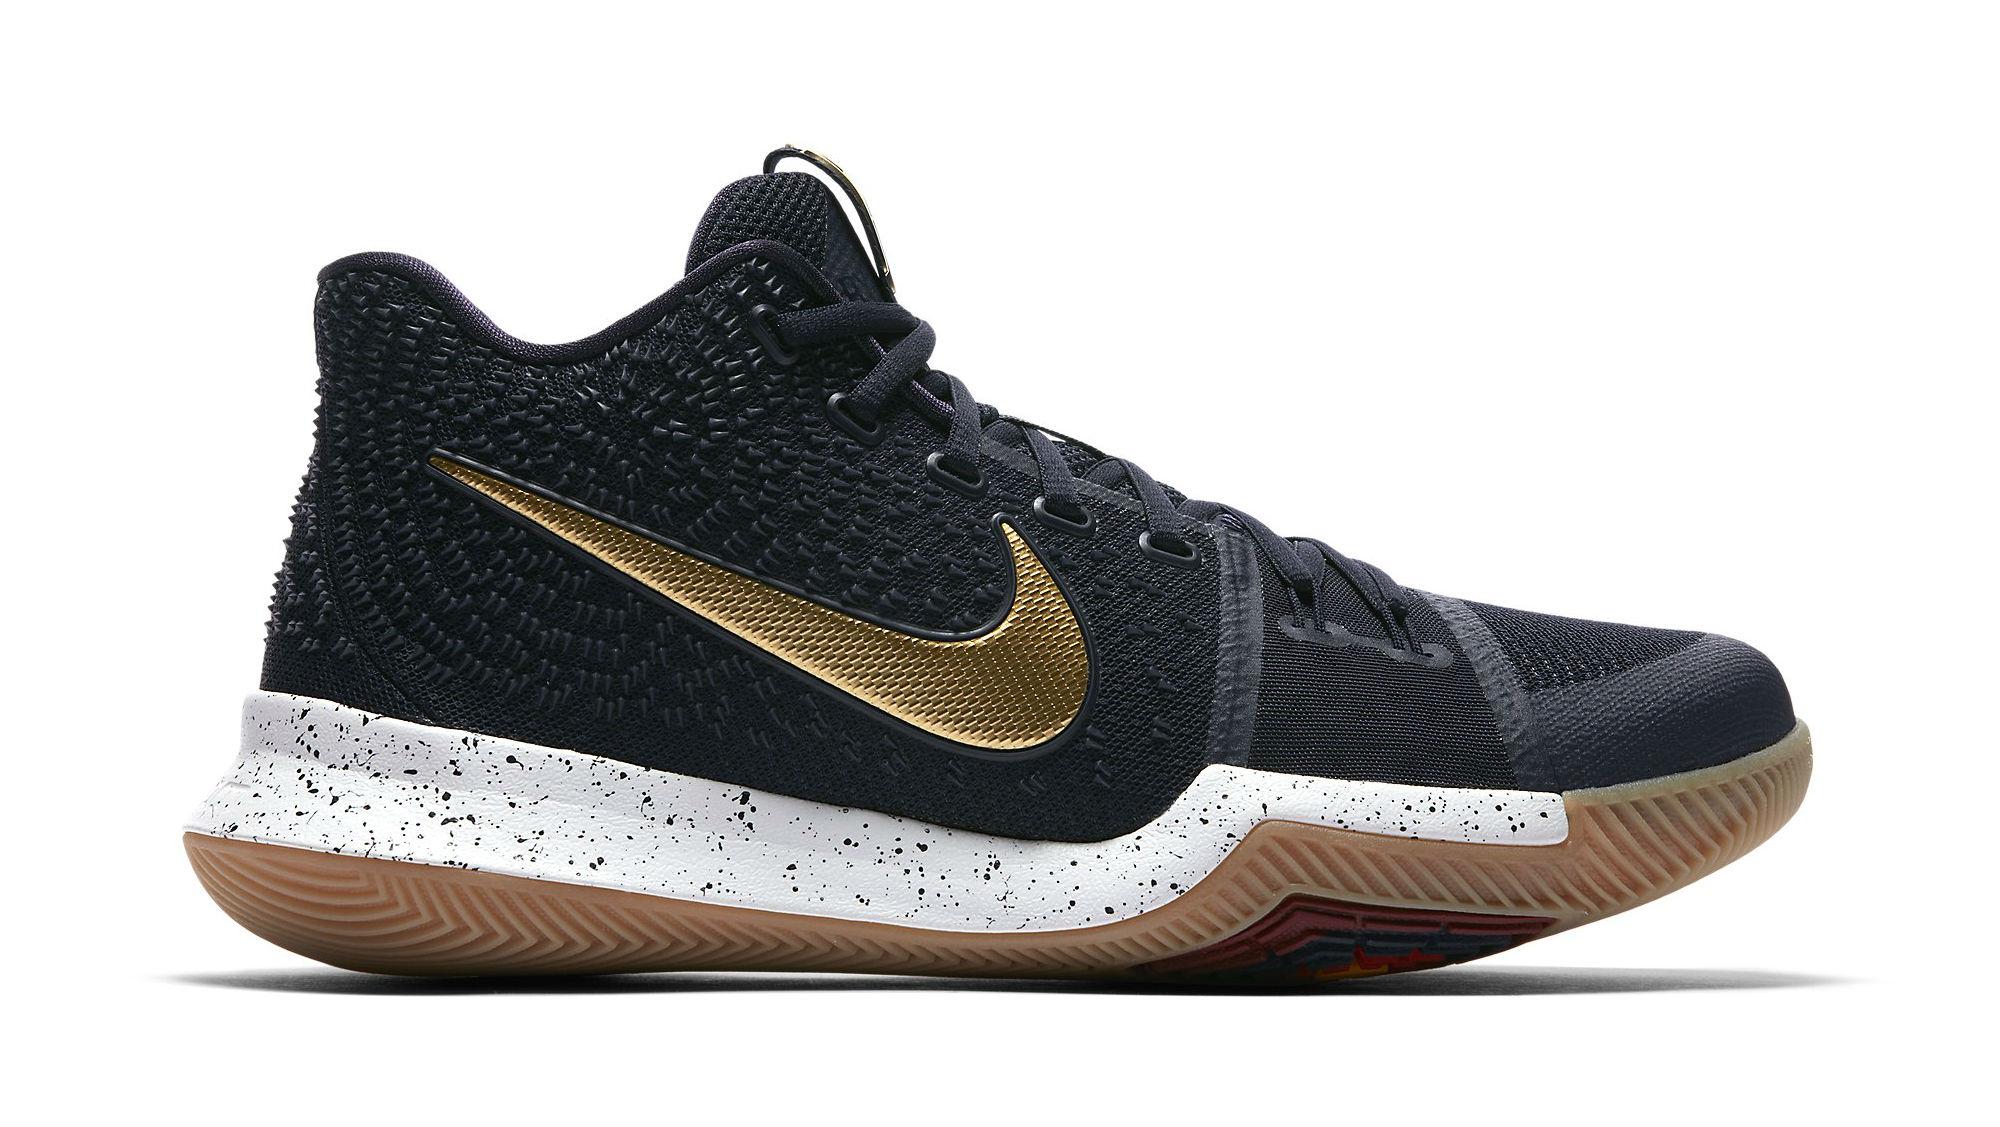 Nike Kyrie 3 Black/Sail-Metallic Gold-Cool Grey